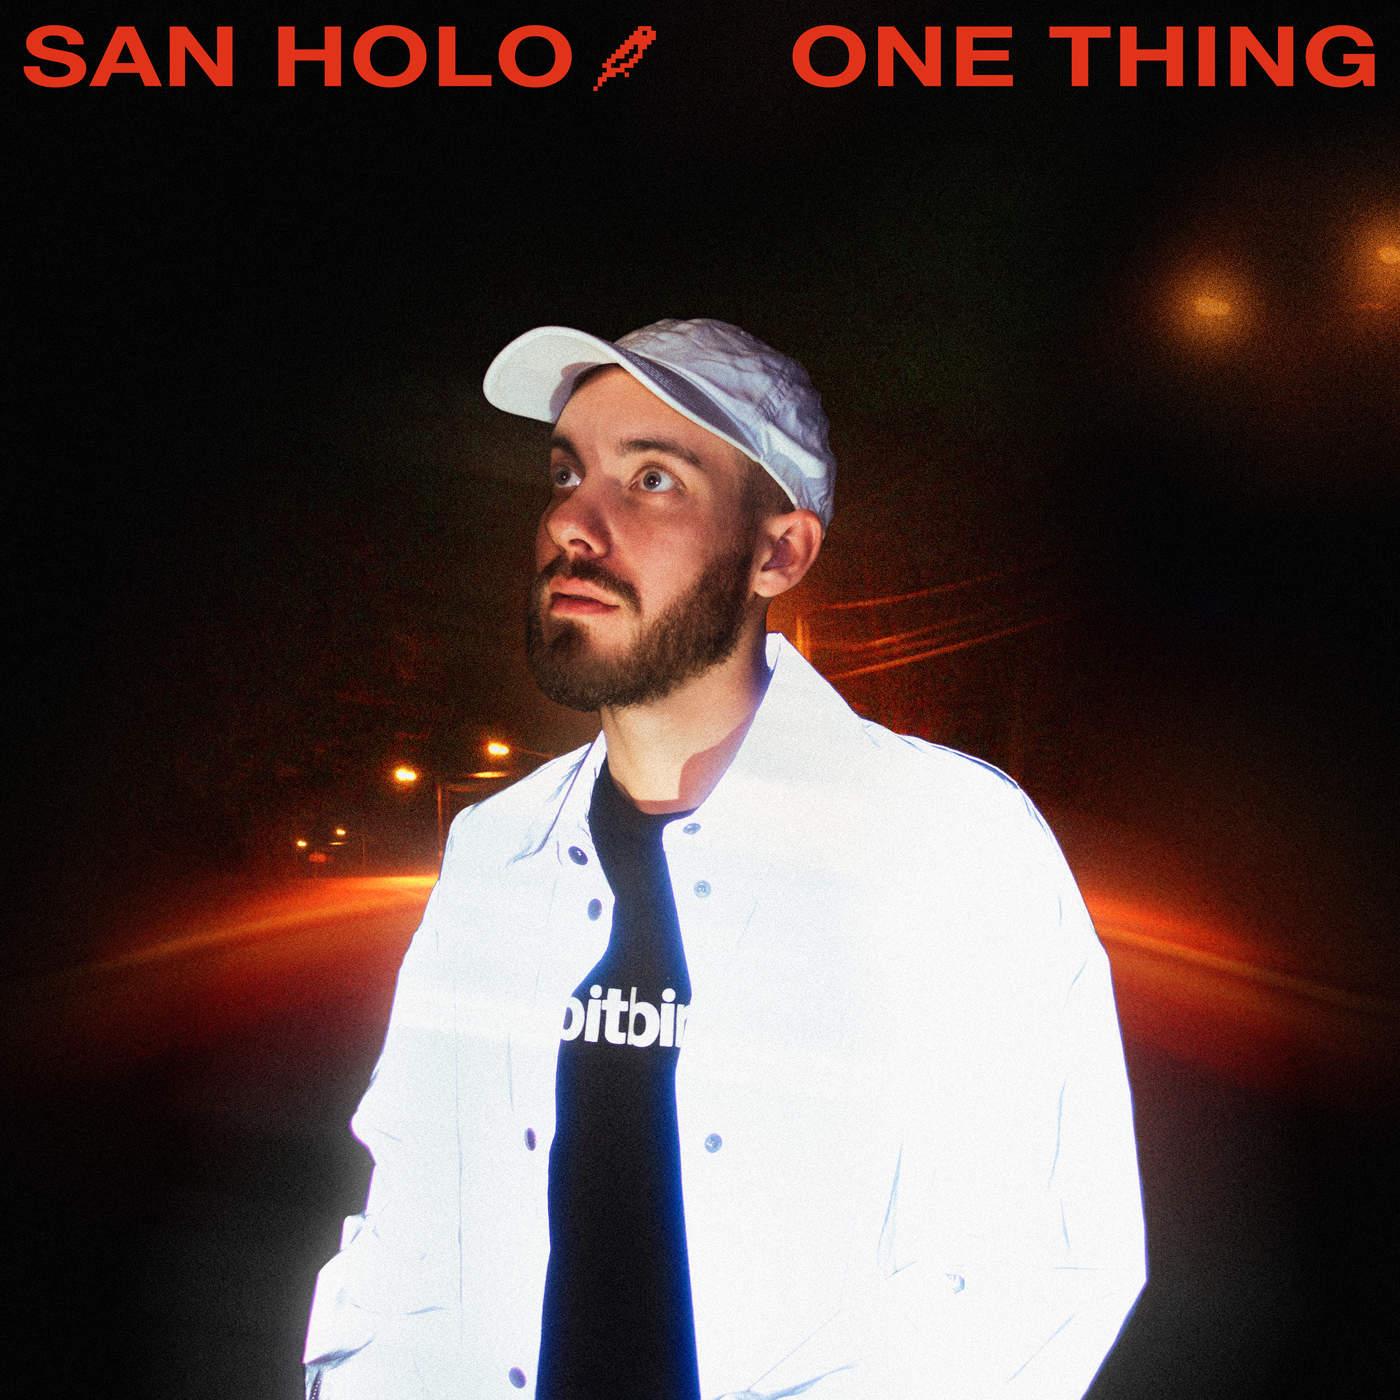 San Holo - One Thing - Single